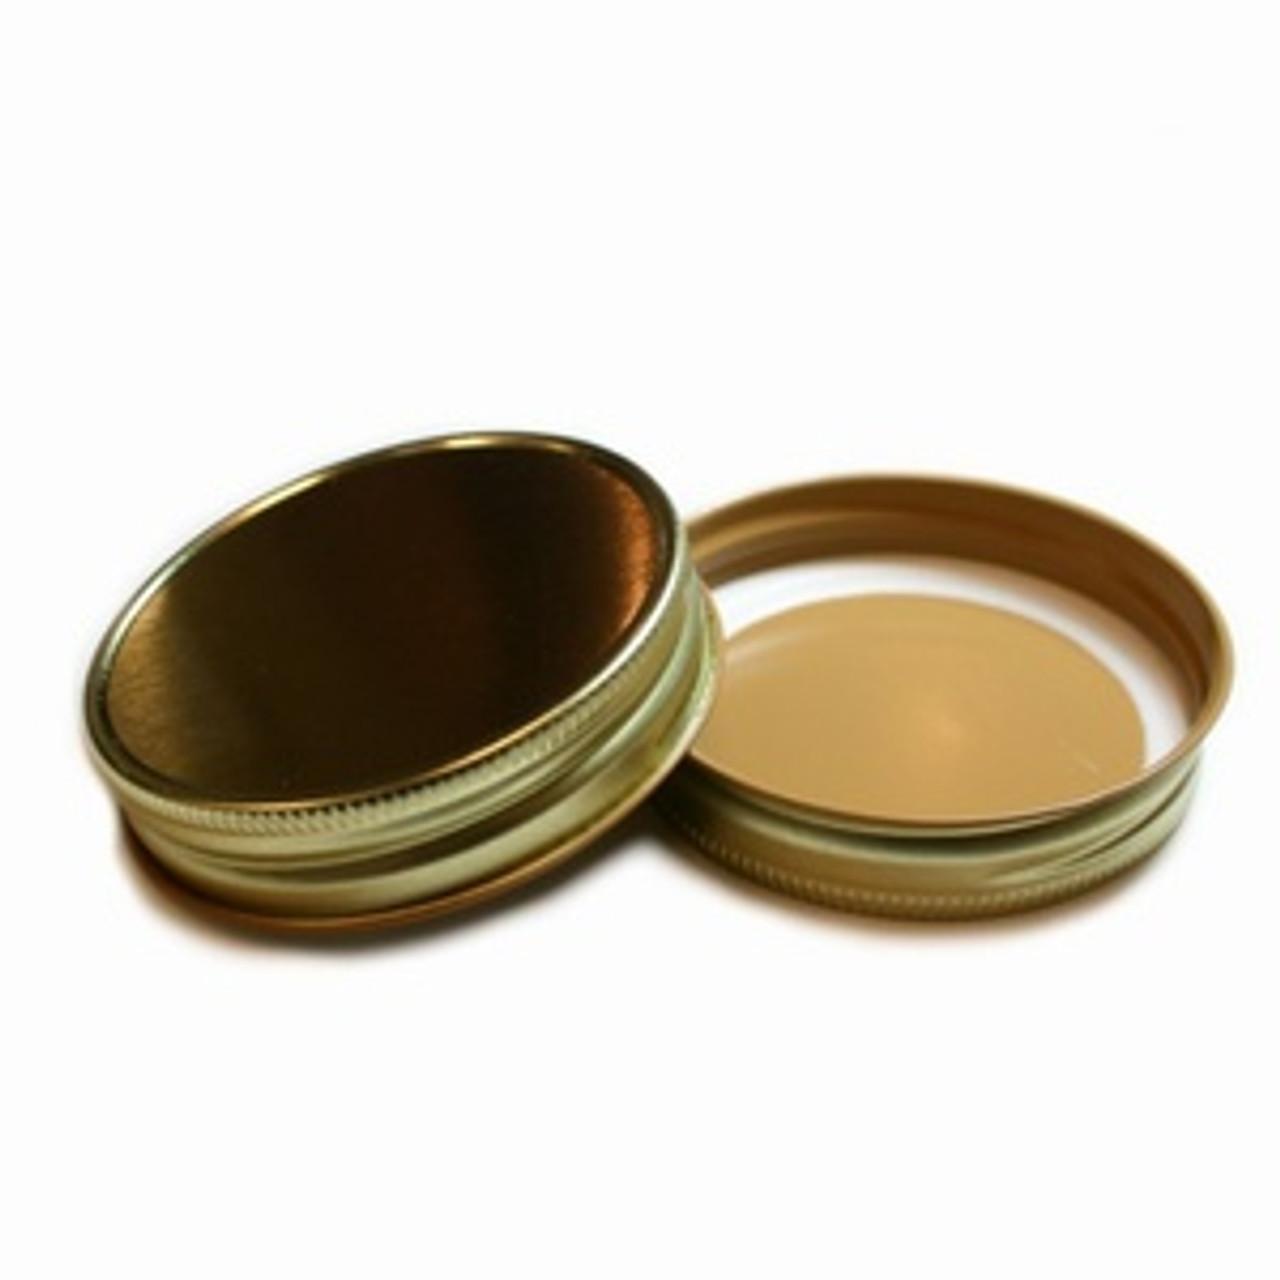 Plastisol Mason Jar Lid - Gold